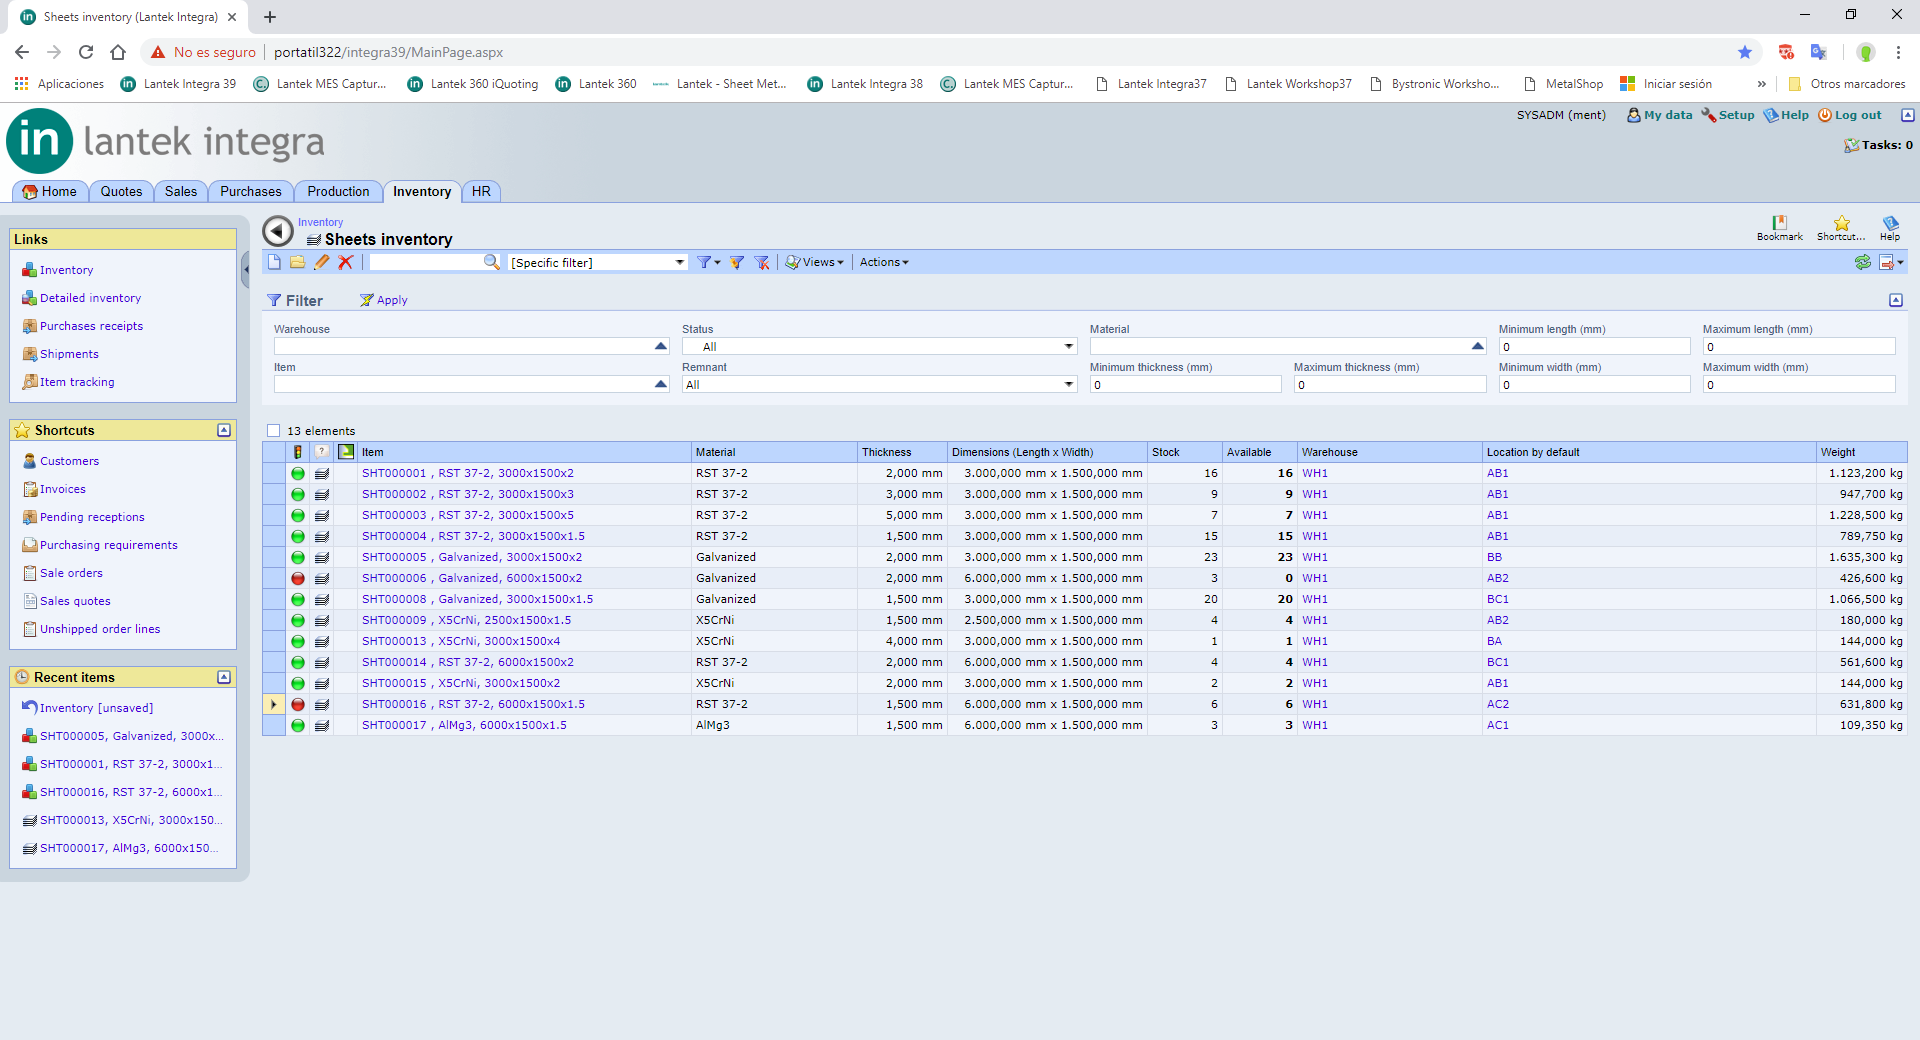 Lantek Integra Inventory  - Movements